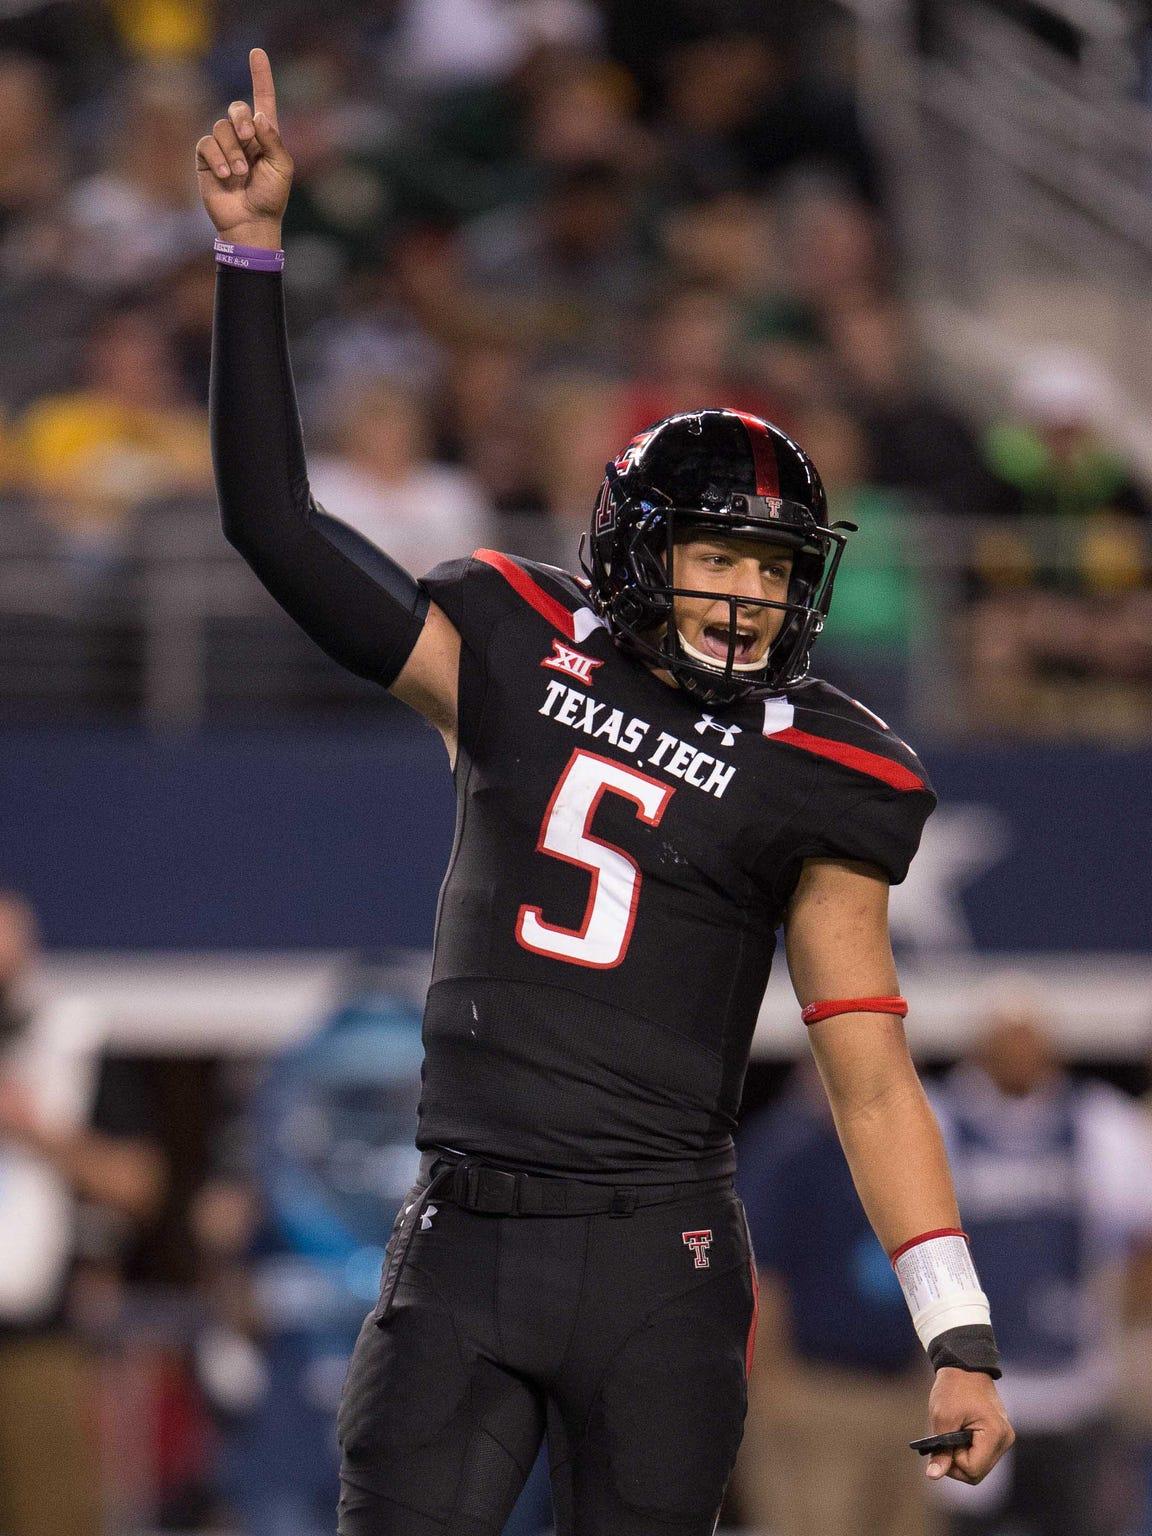 Texas Tech quarterback Pat Mahomes